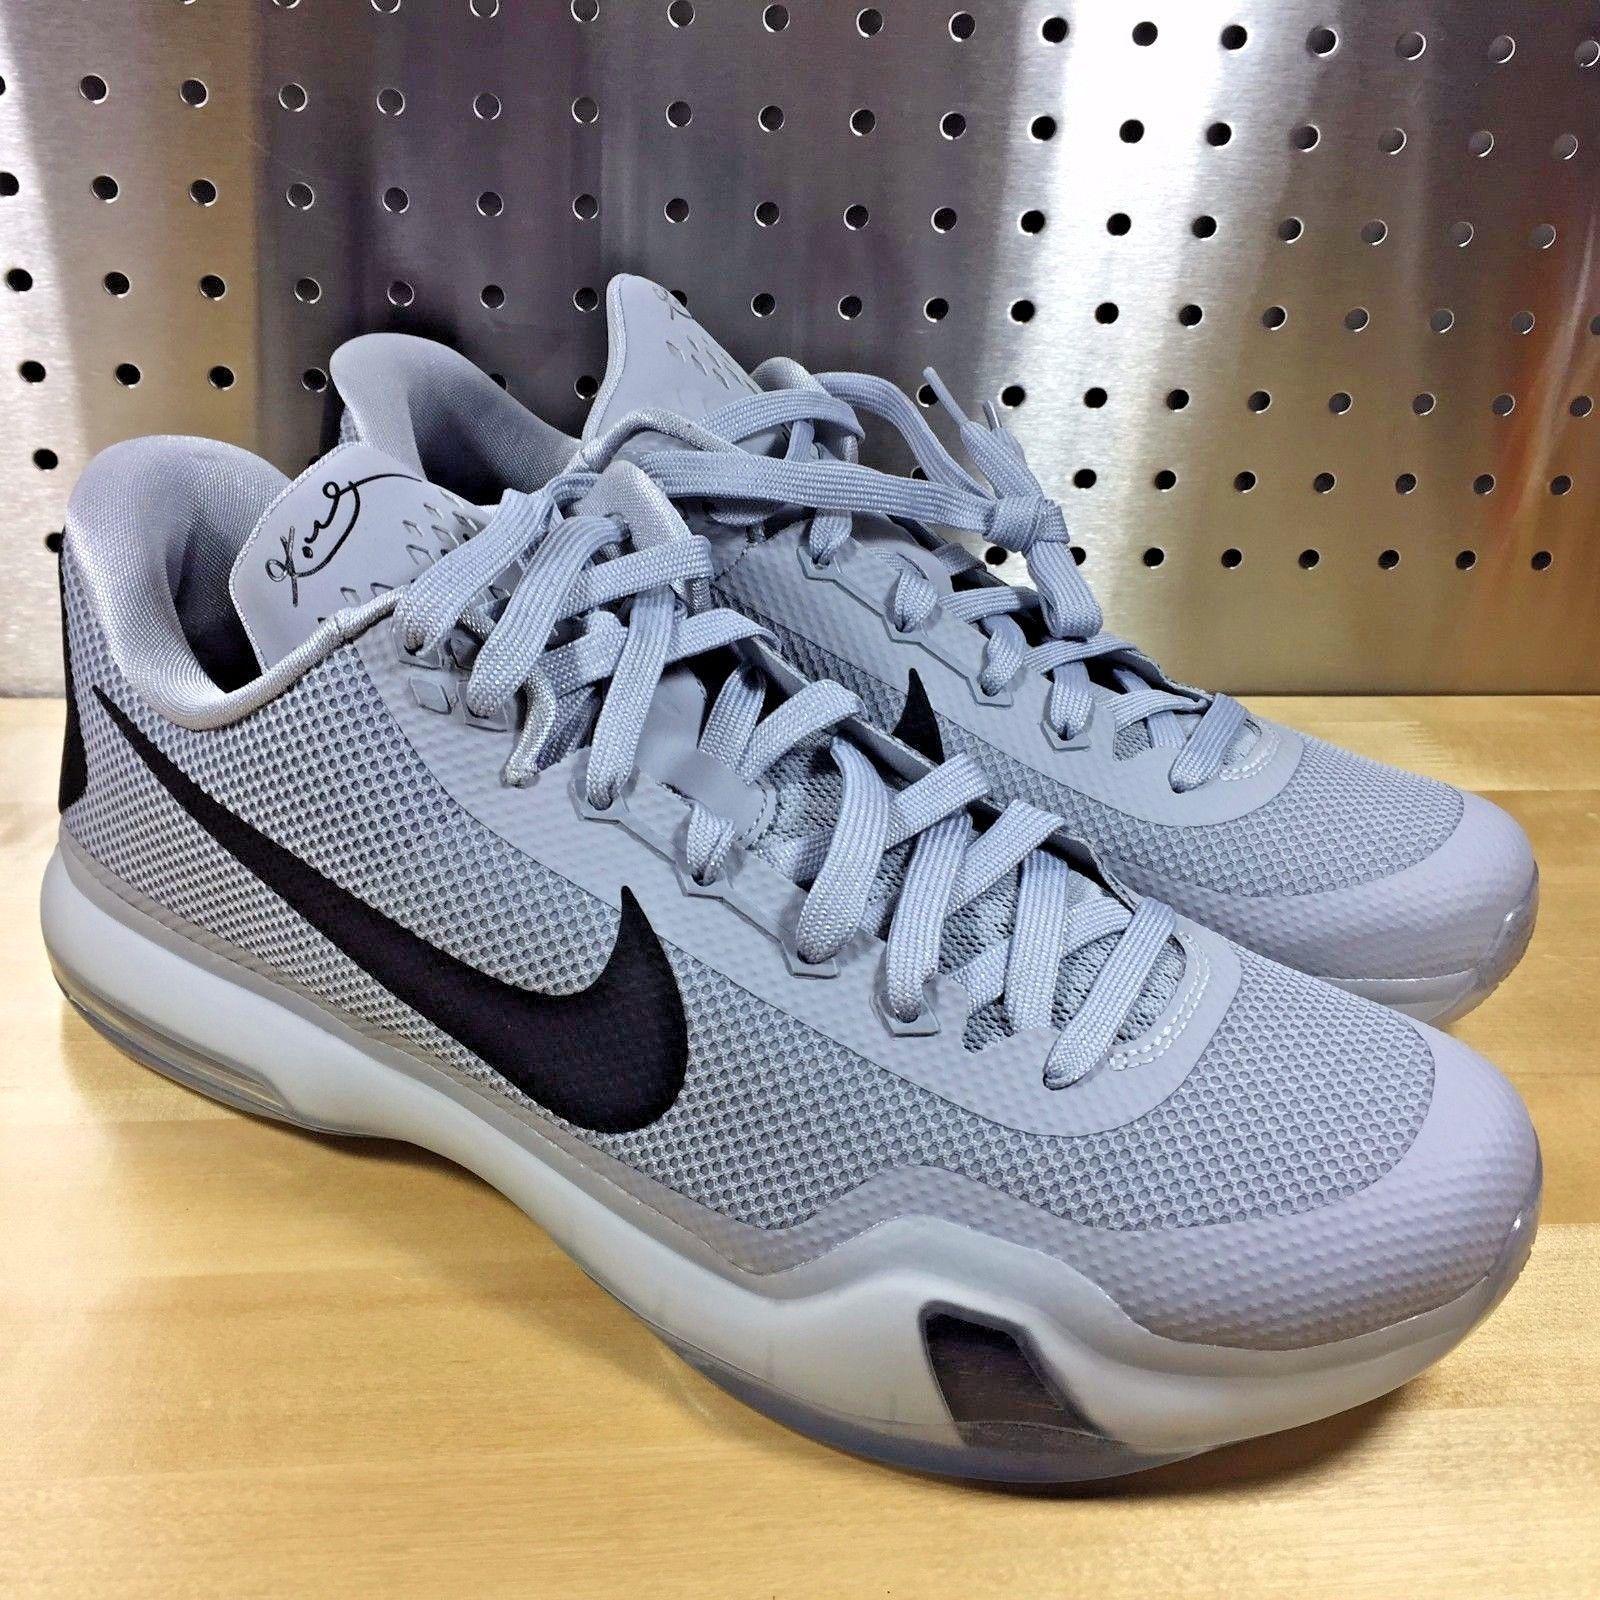 8d47b8bb614 reduced mens nike kobe x 10 tb elite basketball shoes 813030 011 size 12  grey 13294